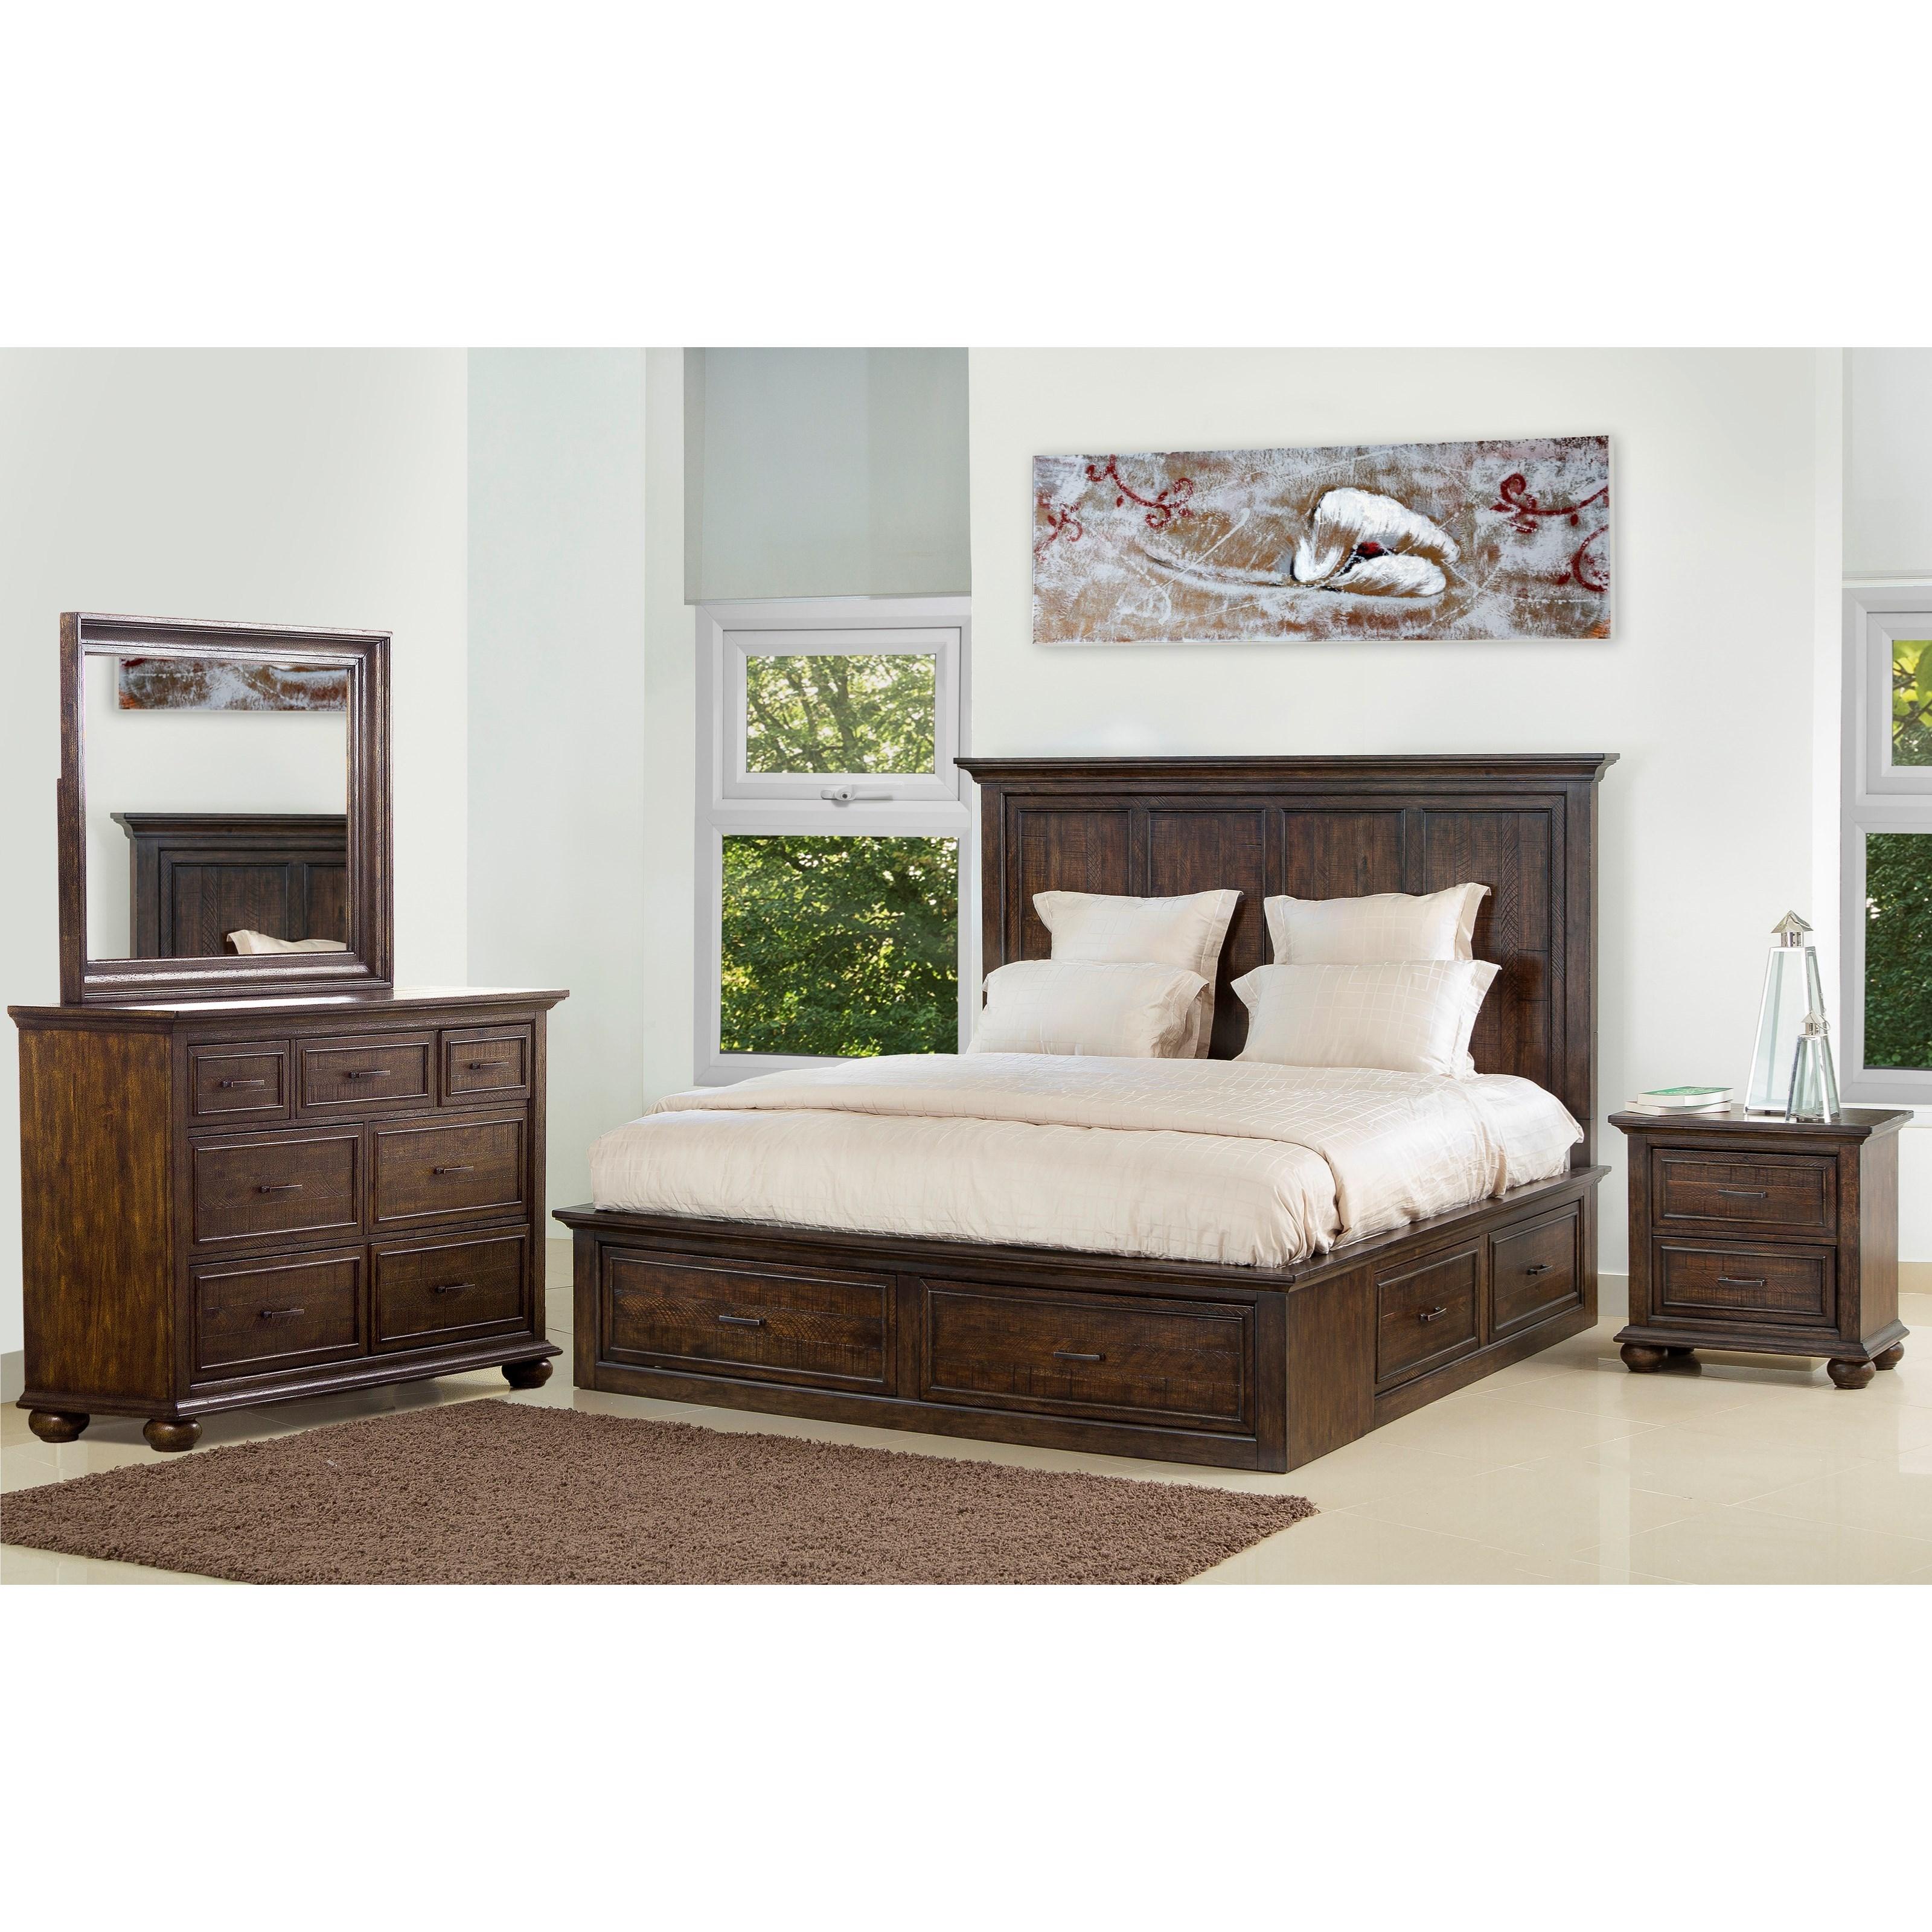 Superb Samuel Lawrence Chatham Park Queen Bedroom Group 1